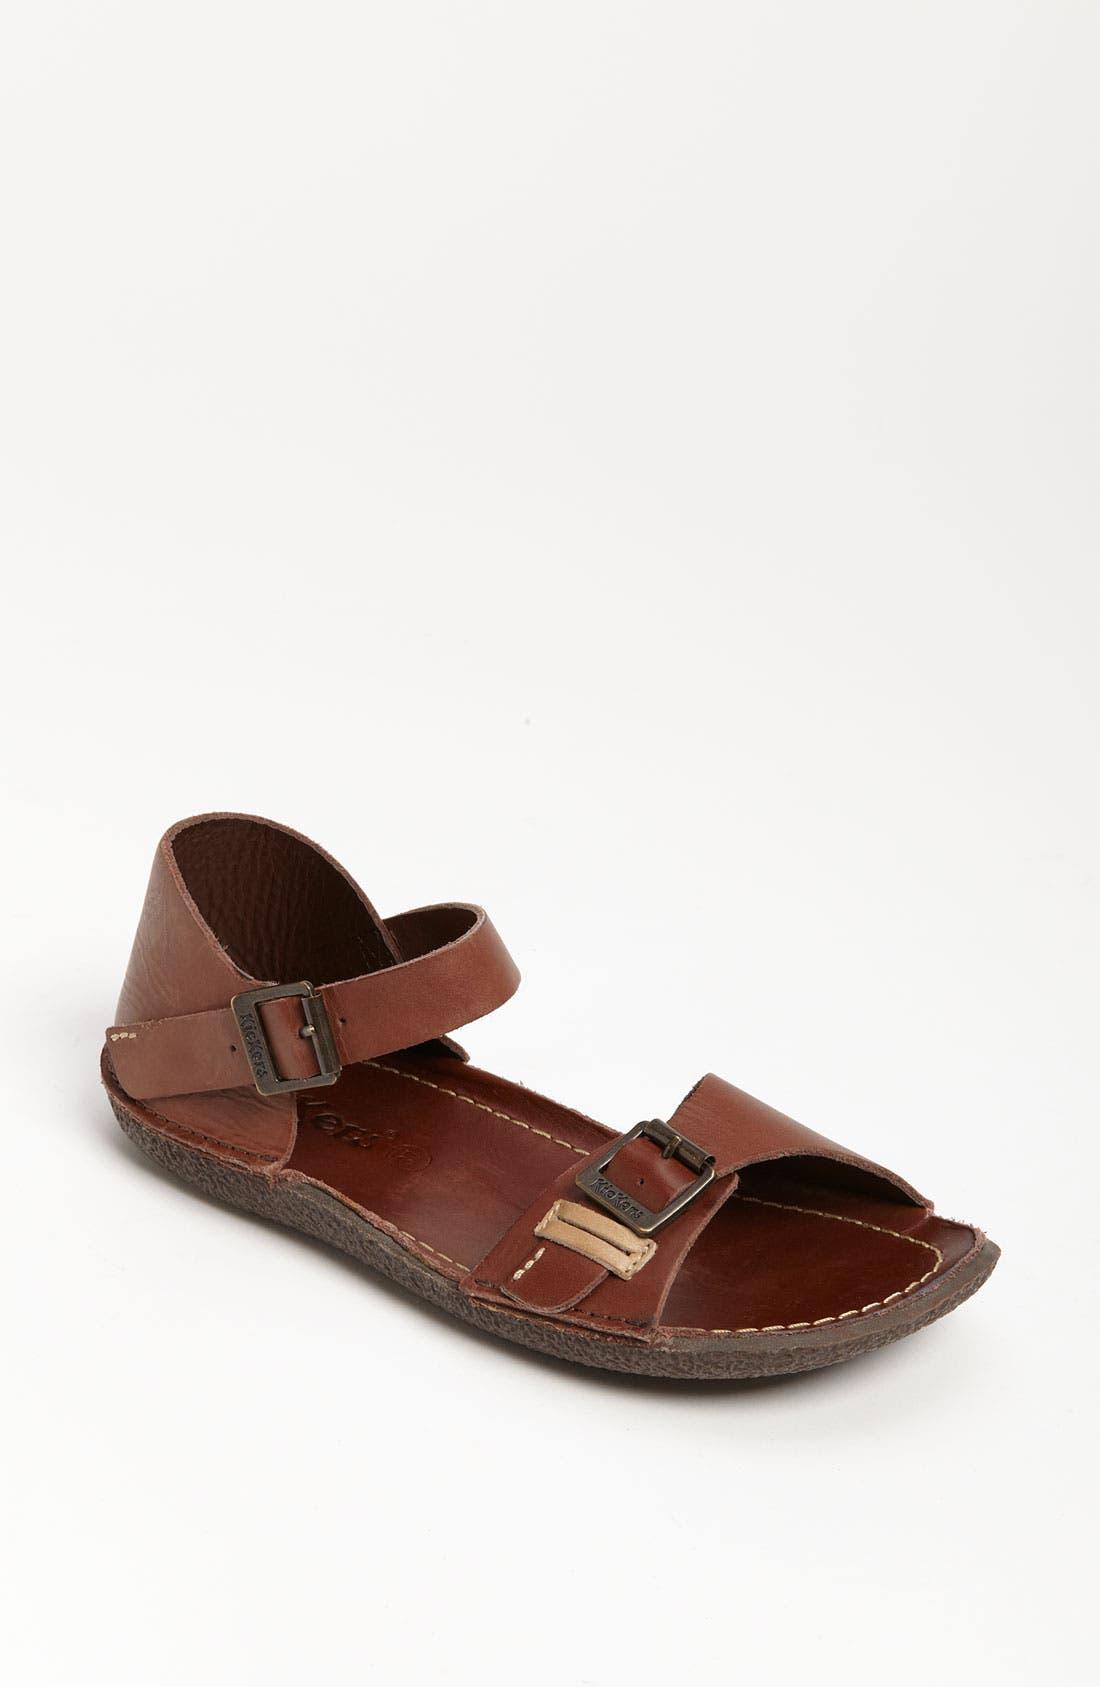 Main Image - Kickers 'Pastille' Sandal